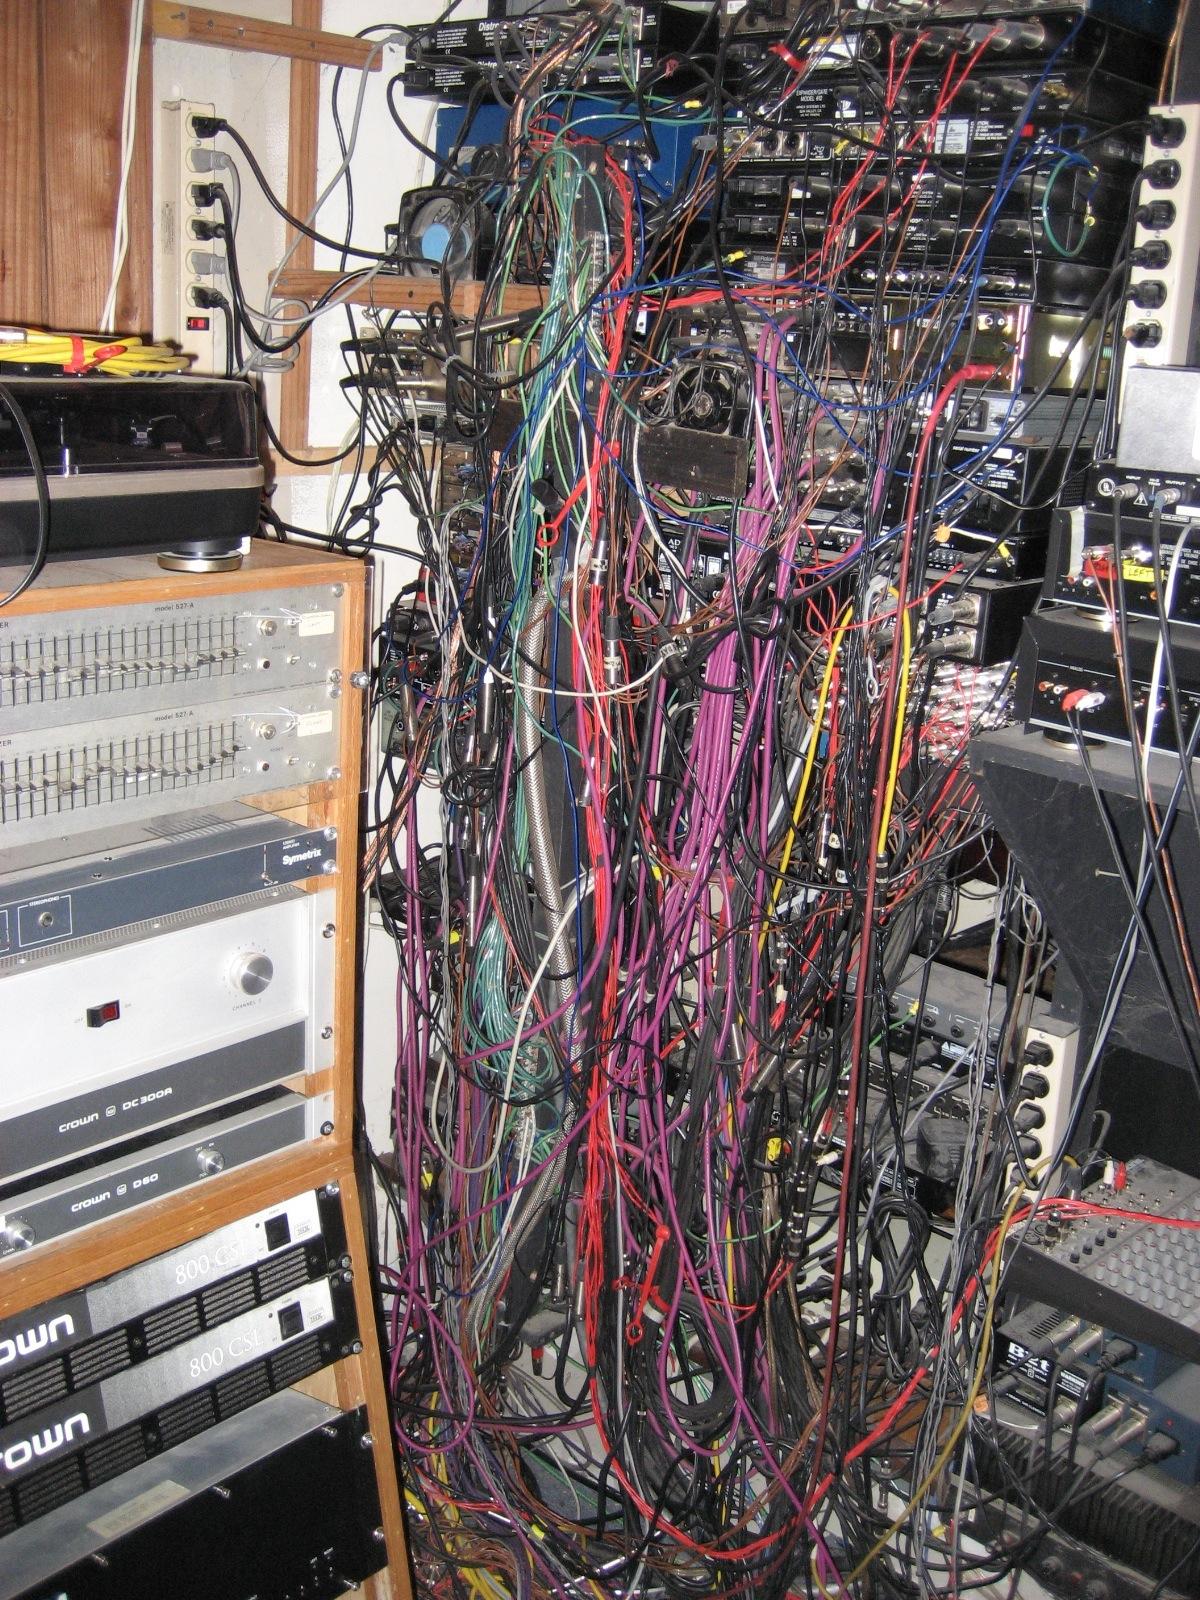 post  slutty messy studio pics gearslutz pro audio